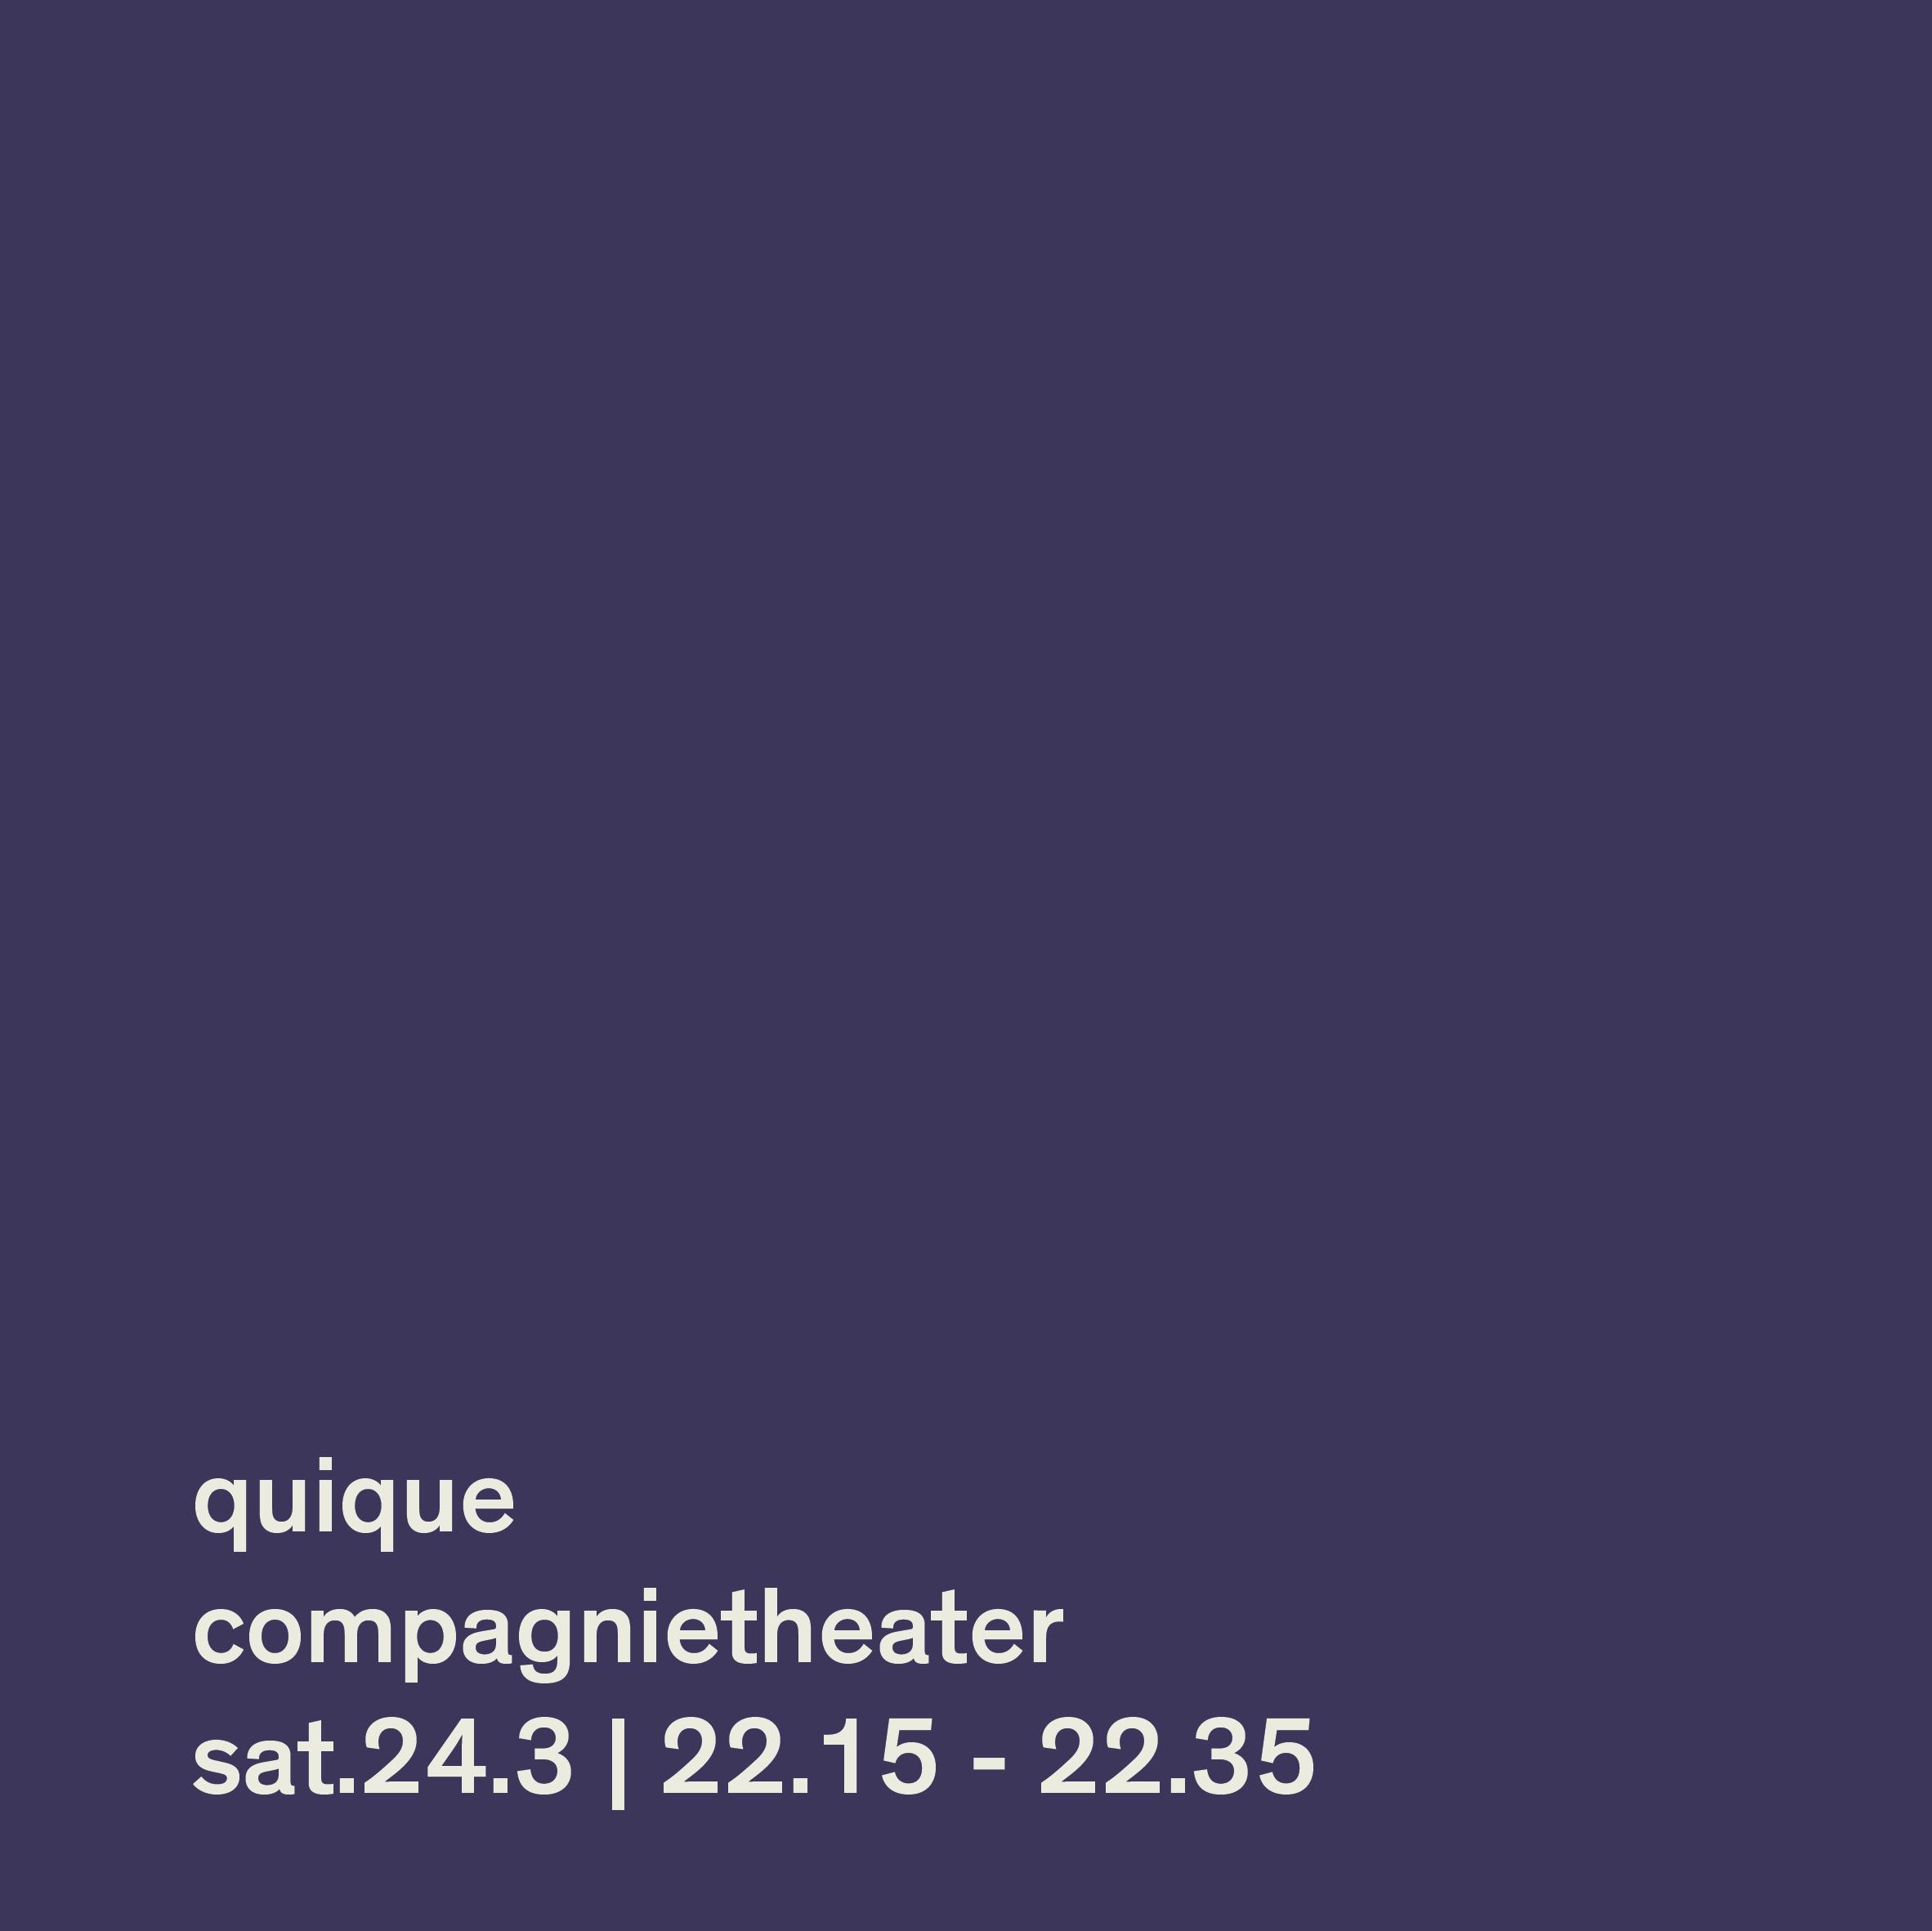 website-blocks_QUIQUE.png